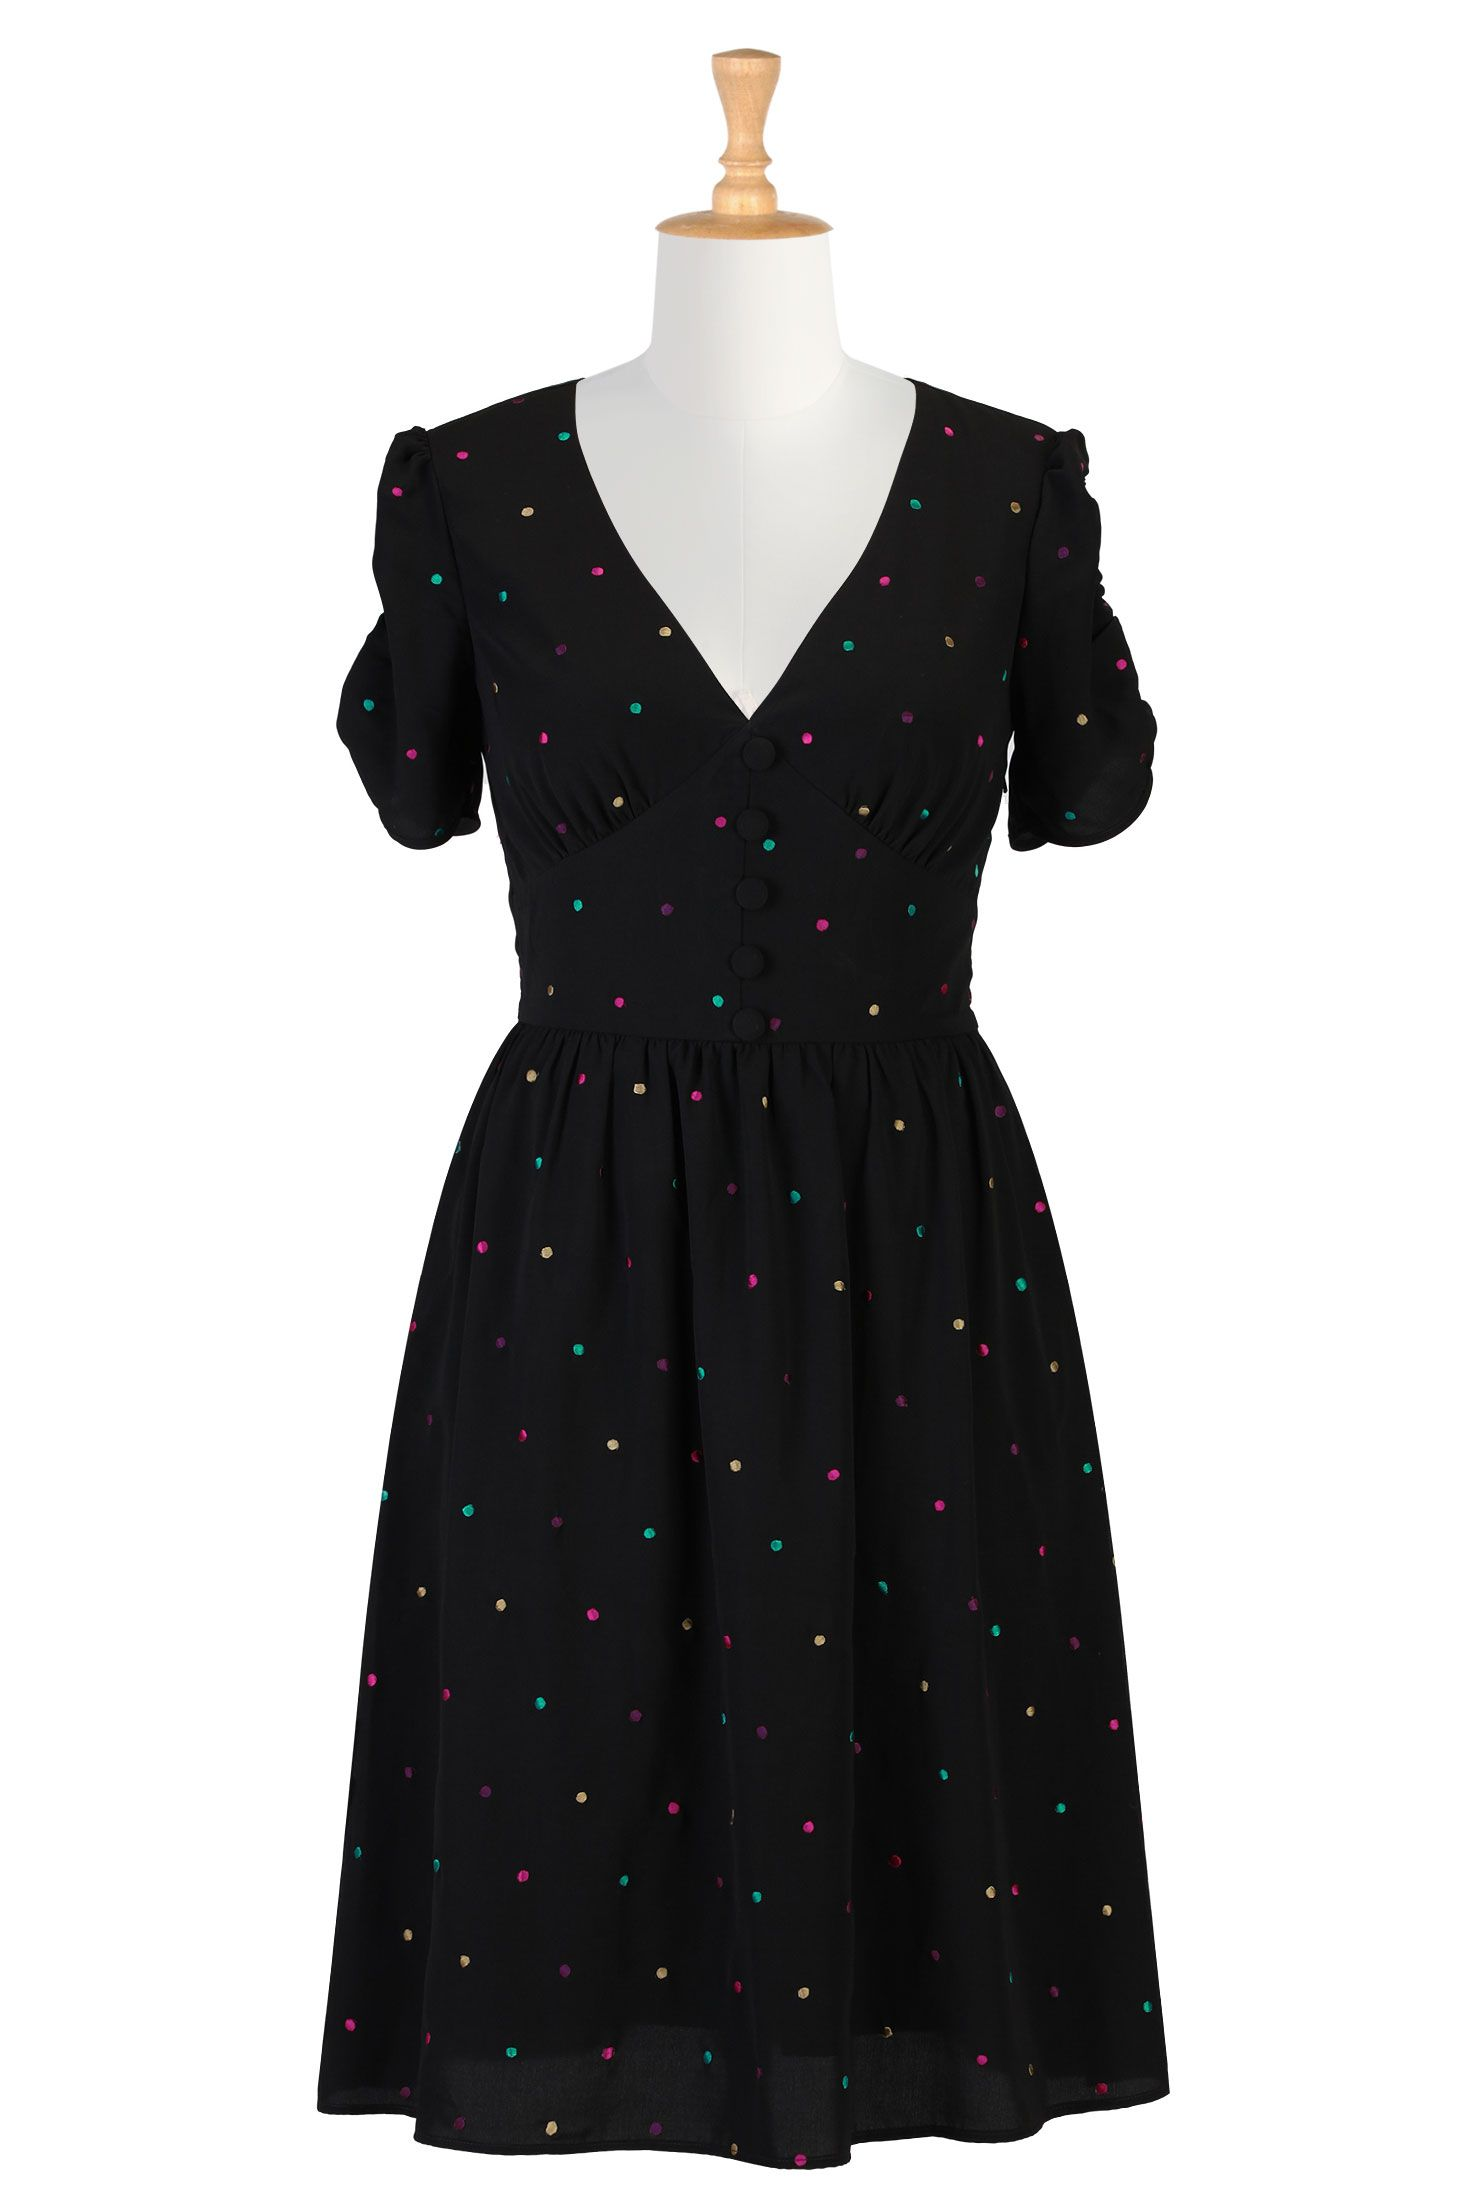 Shop Women S Designer Fashion Online Custom Womens Clothing Dresses Blouses And Skirts Eshakti Com Vestidos Moda Looks